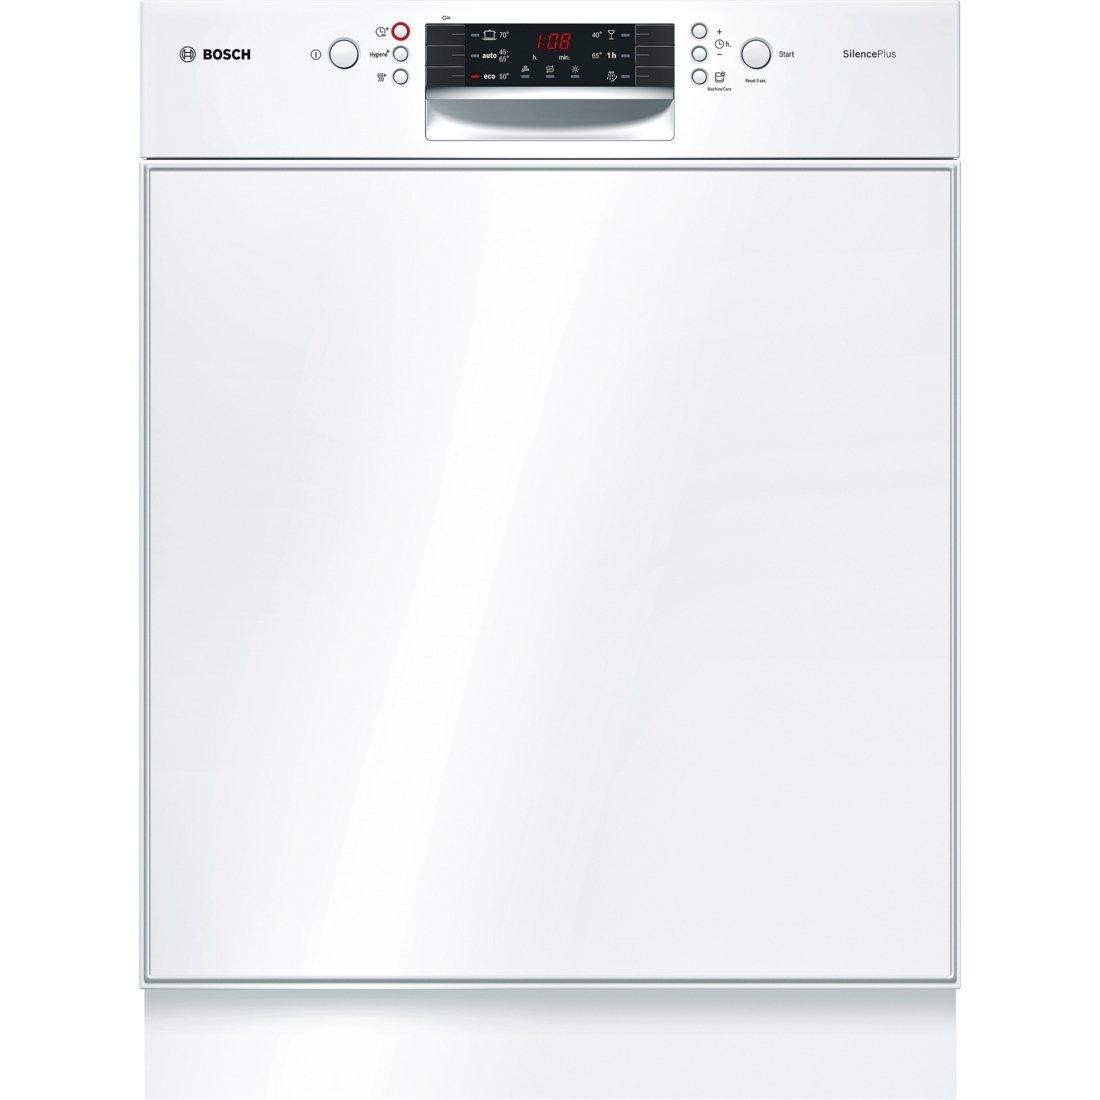 Bosch Serie 4 SMD46GW01E Semi-incorporado 12cubiertos A++ ...